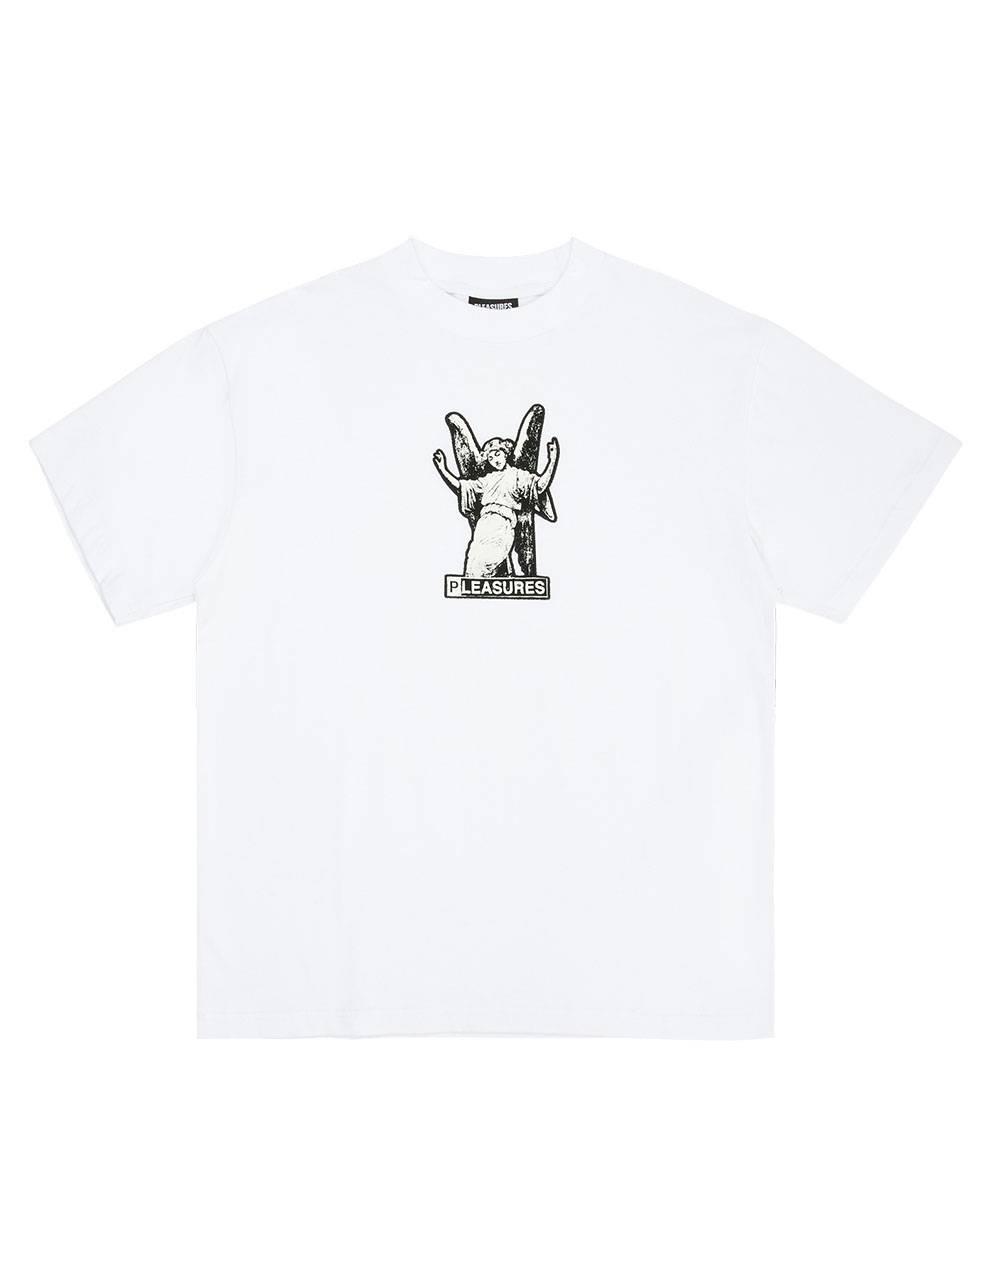 Pleasures Fetish heavyweight t-shirt - white Pleasures T-shirt 65,00€